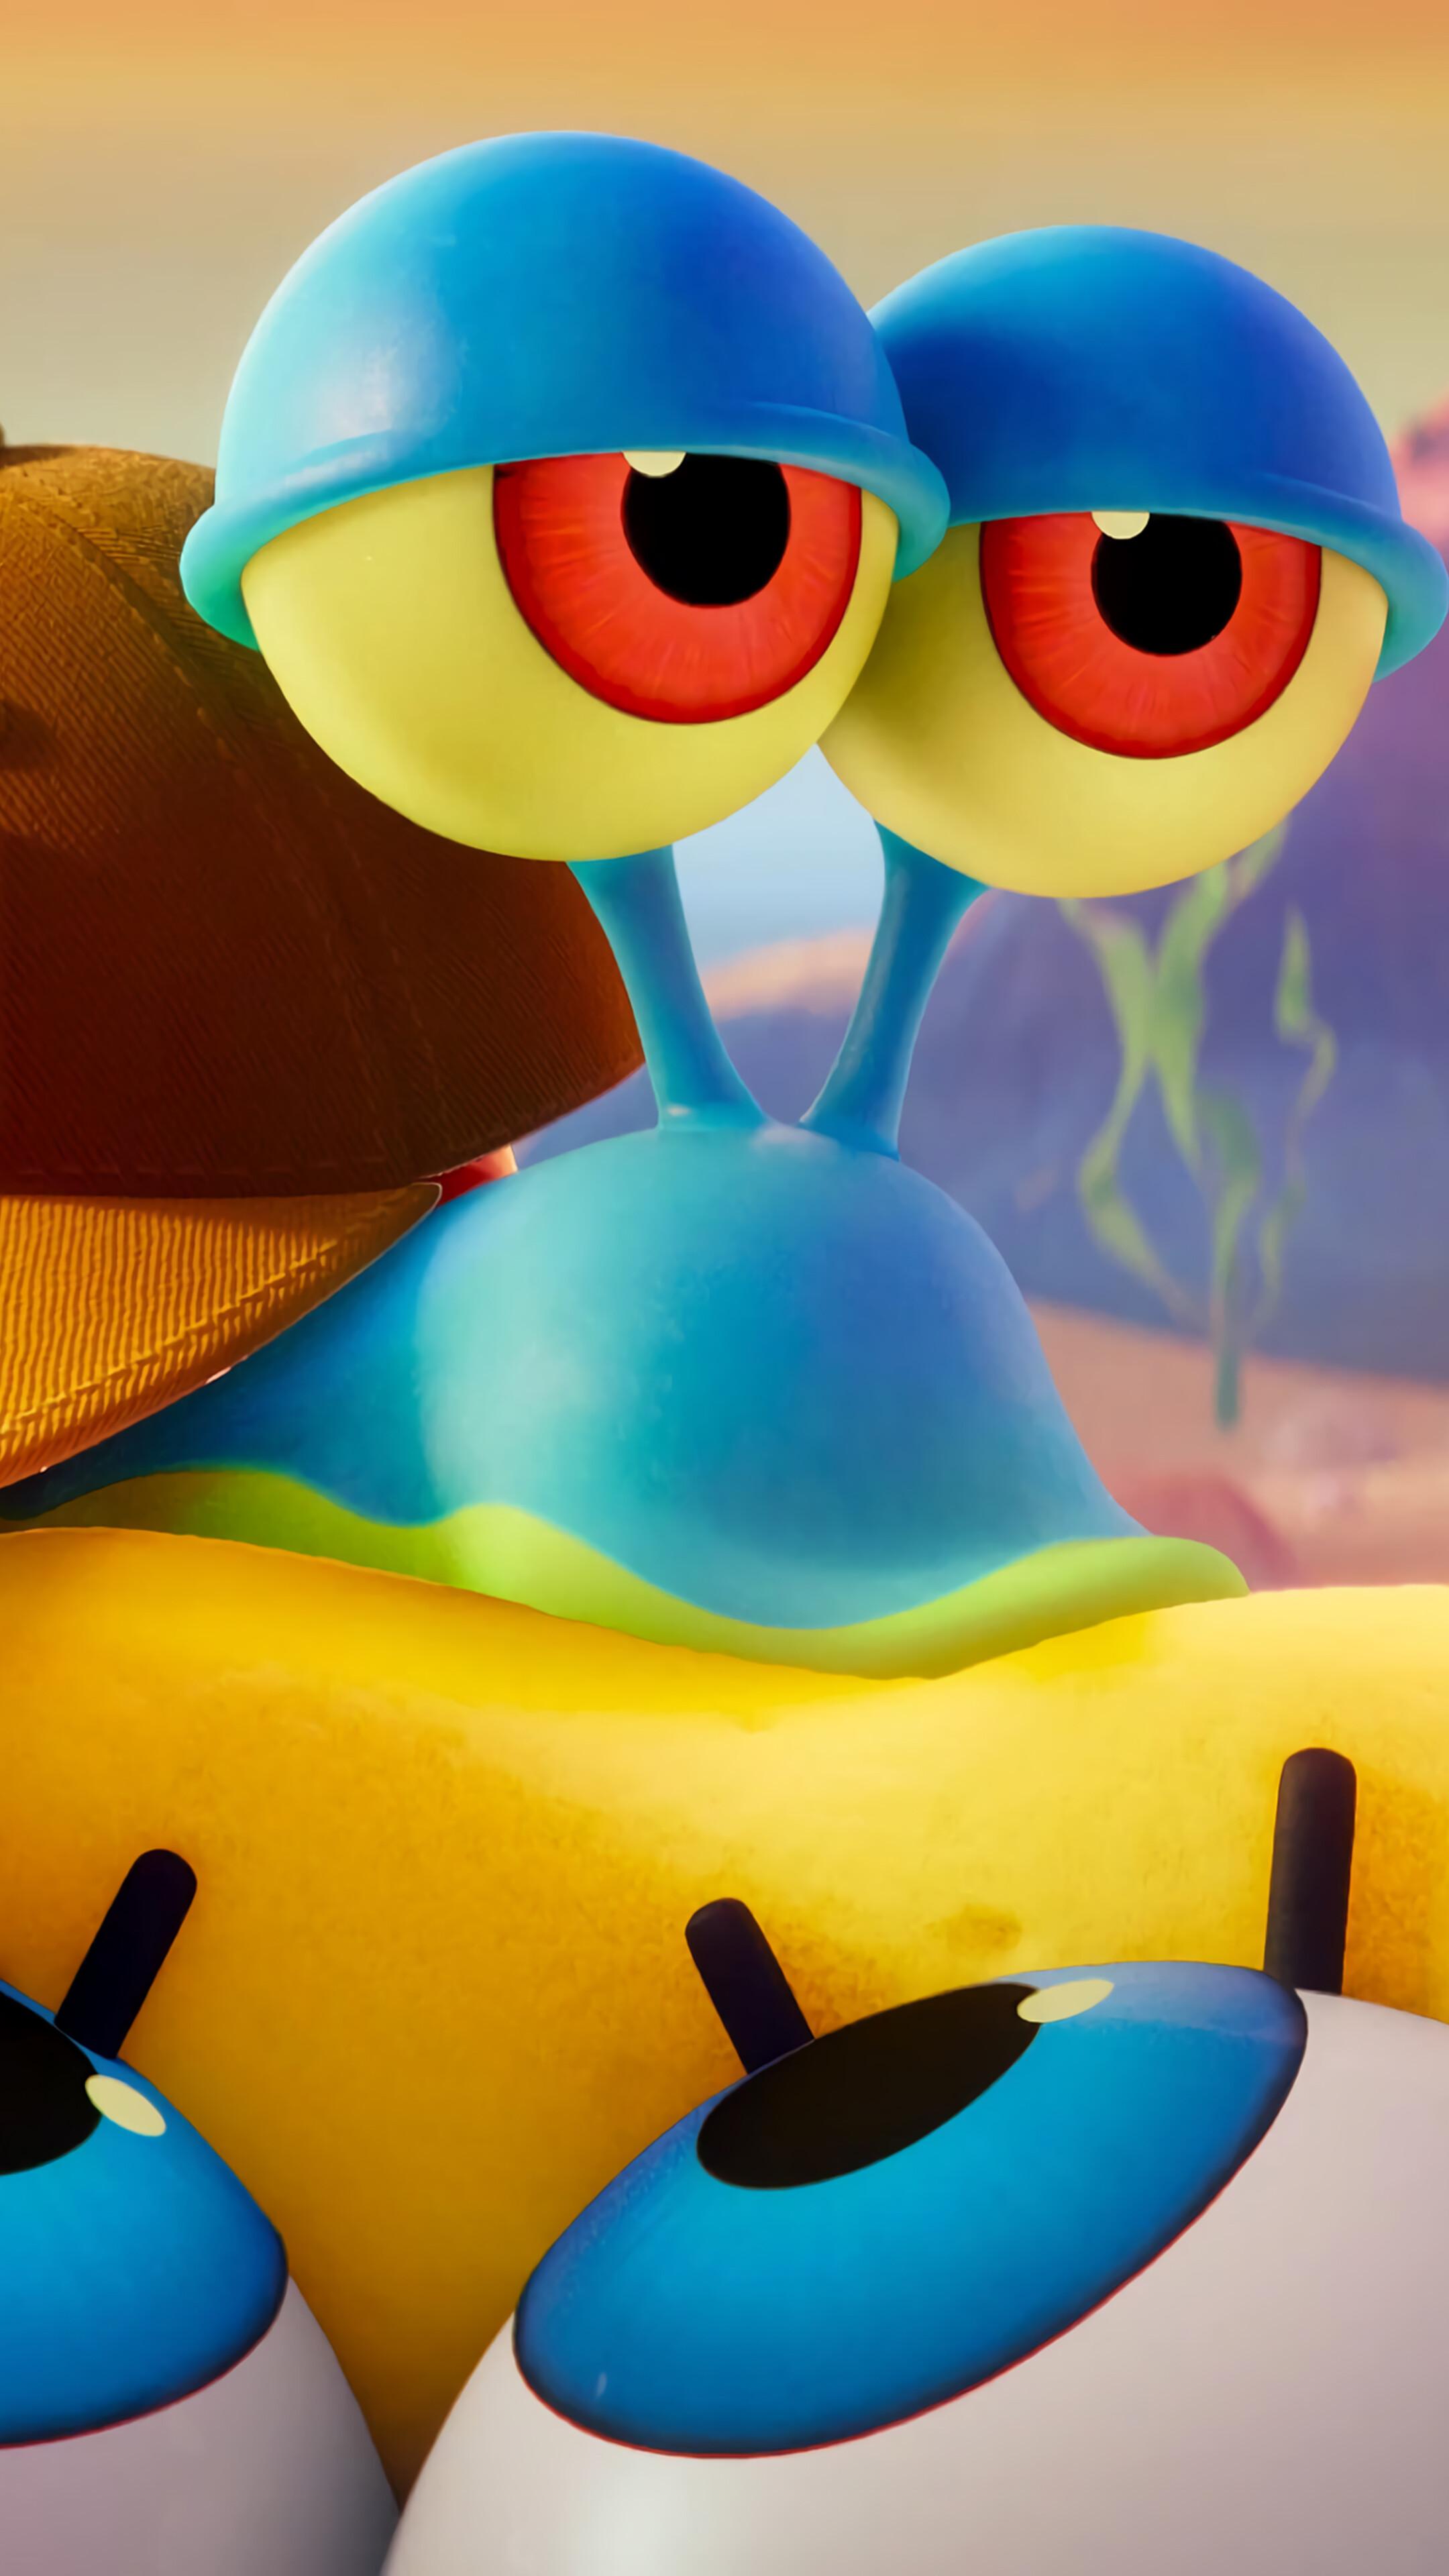 Spongebob, Gary, Spongebob Sponge On The Run, 4k Iphone - Spongebob Movie Gif , HD Wallpaper & Backgrounds